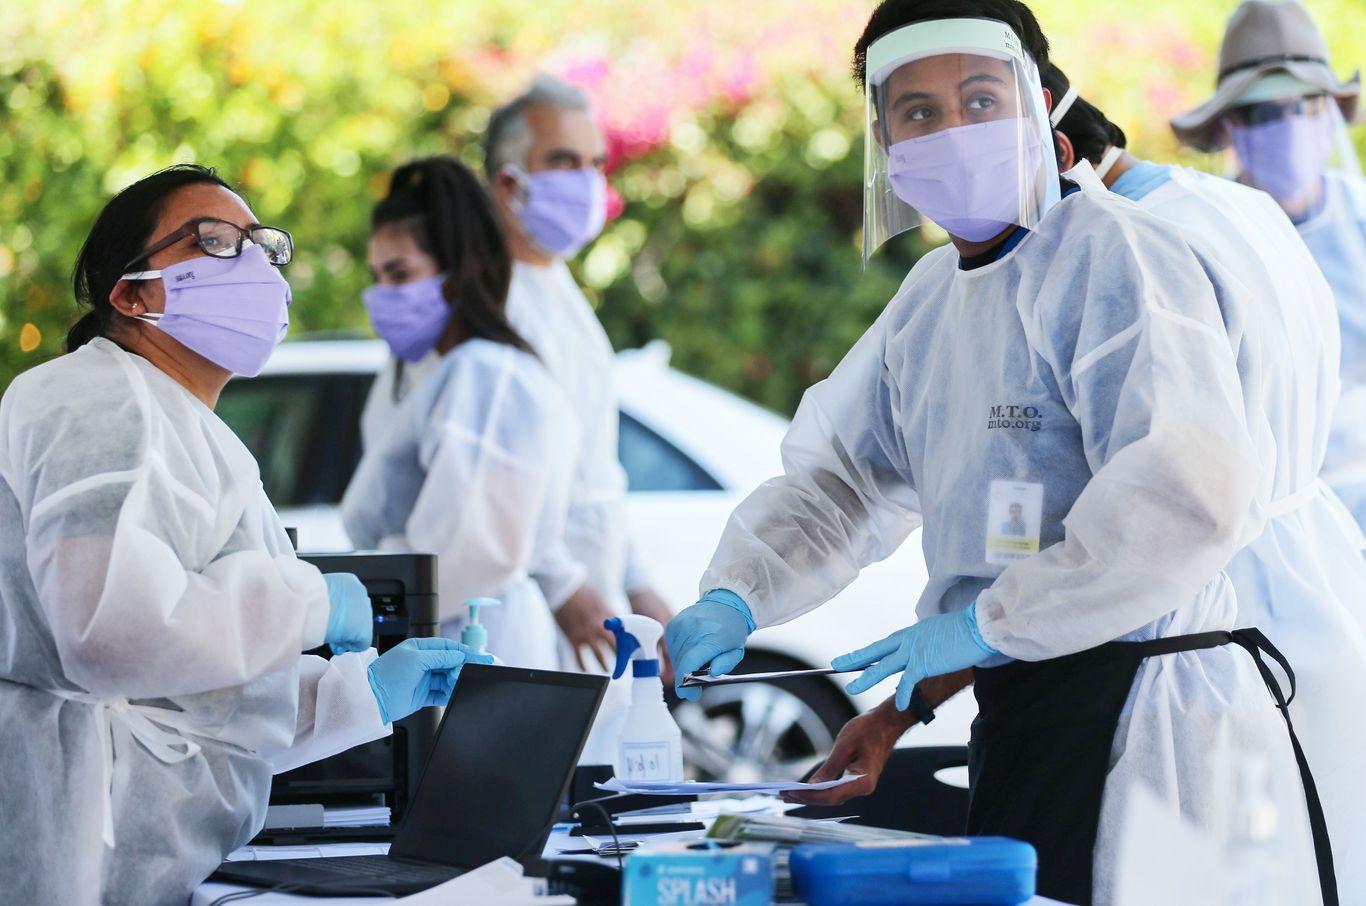 U.S. reports 1,485 coronavirus deaths in a single day thumbnail